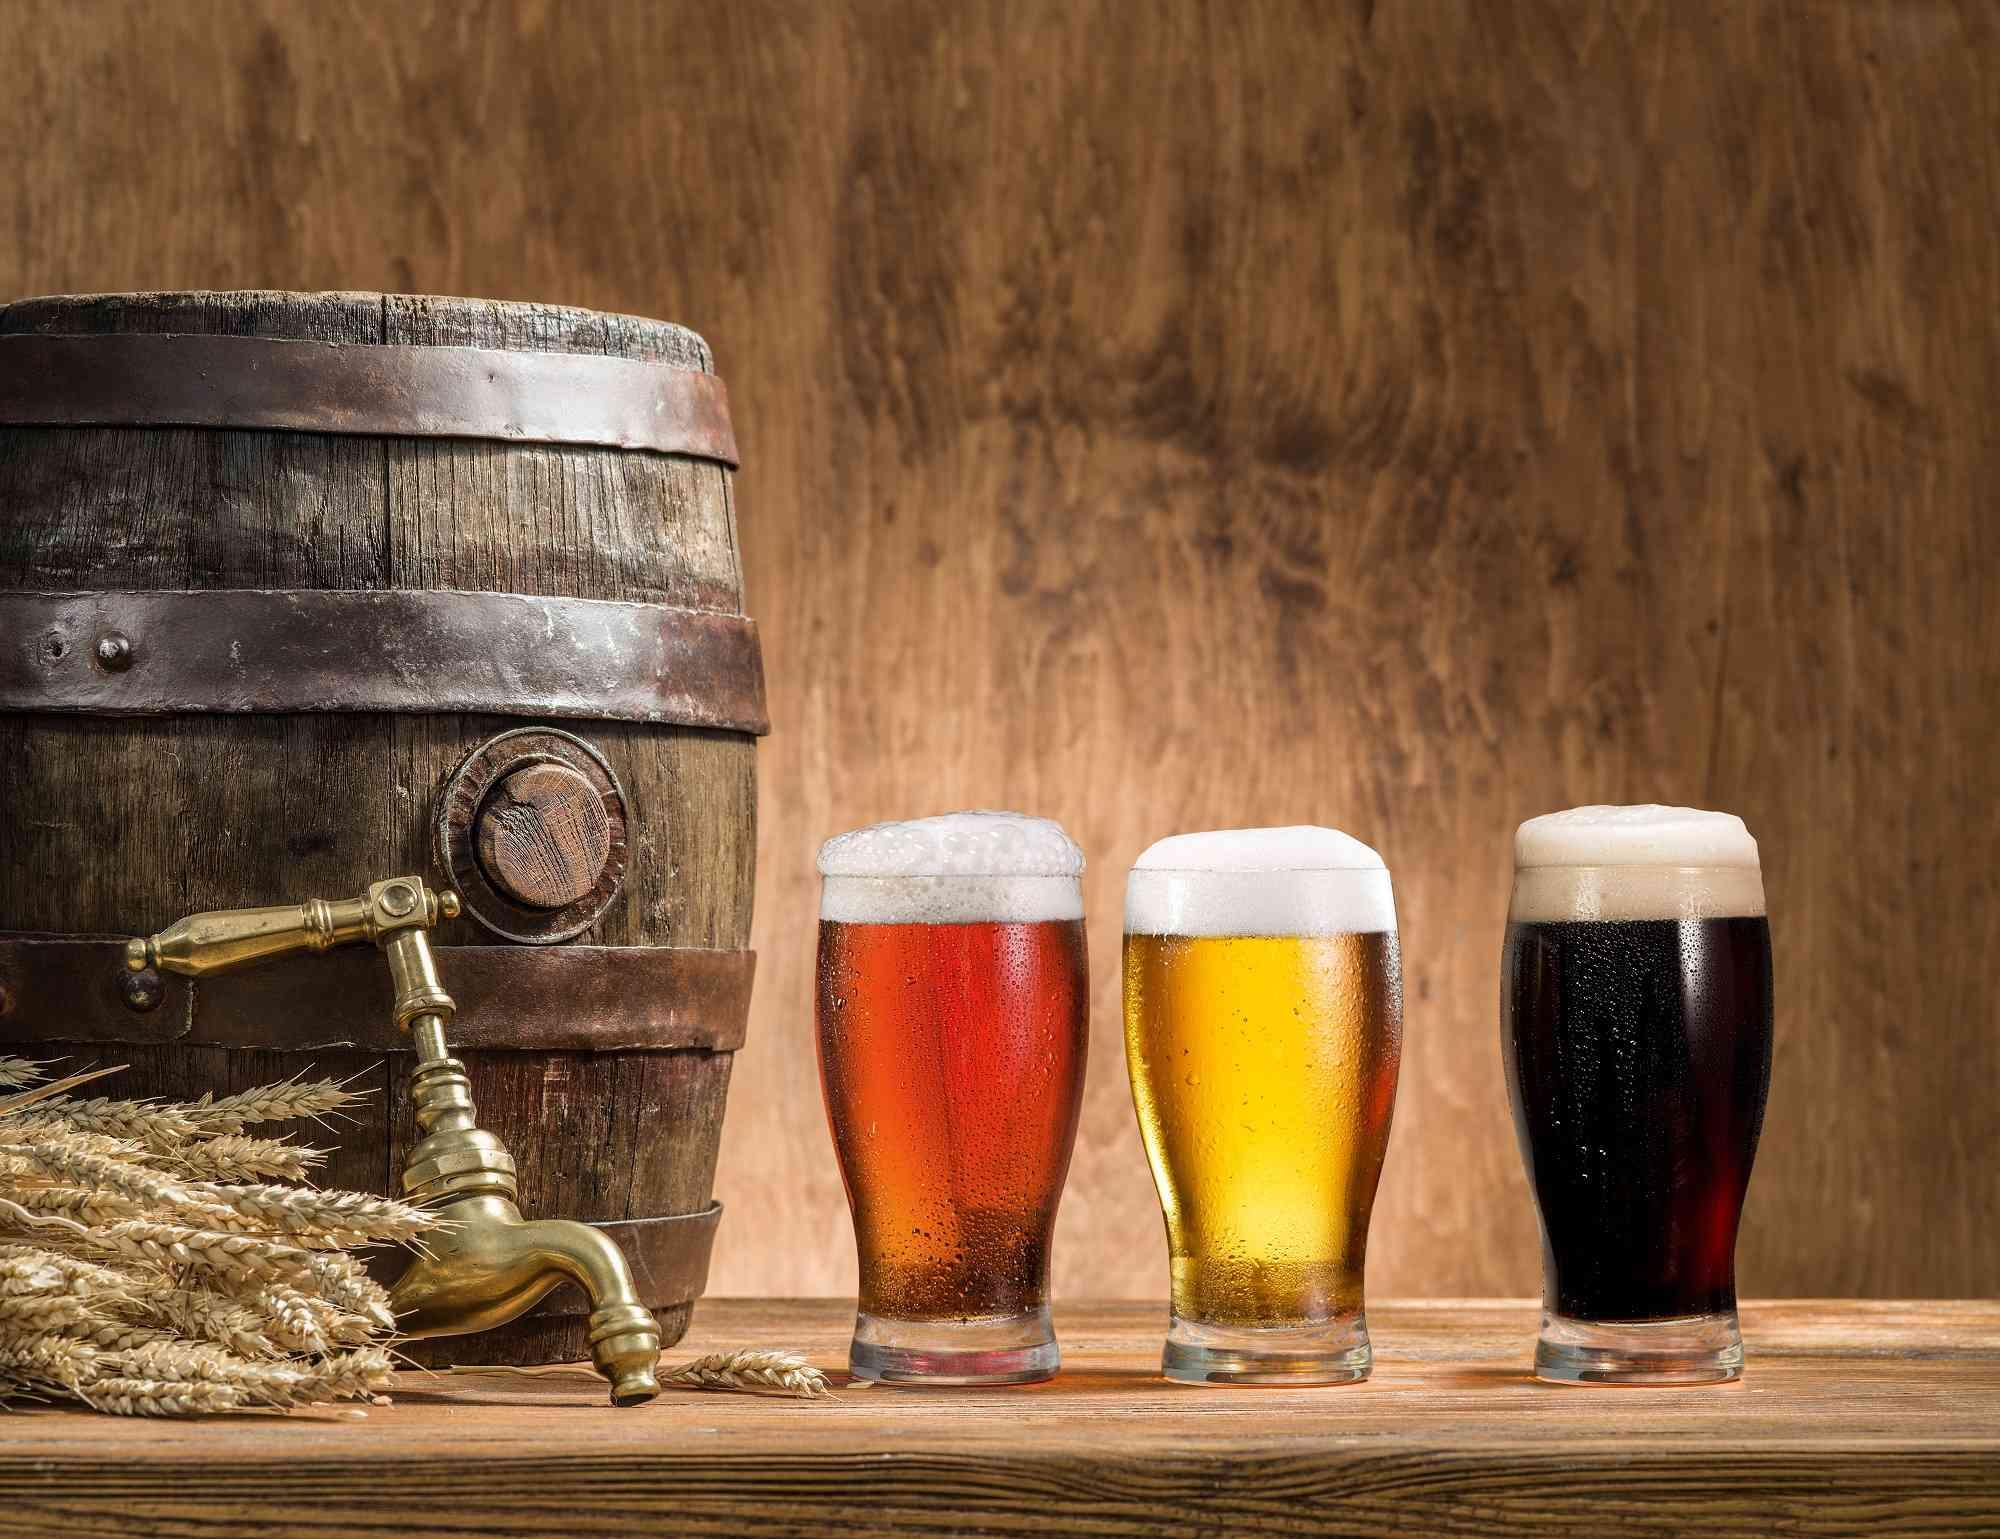 Top-3 Factors Driving the Craft Beer Market in the US